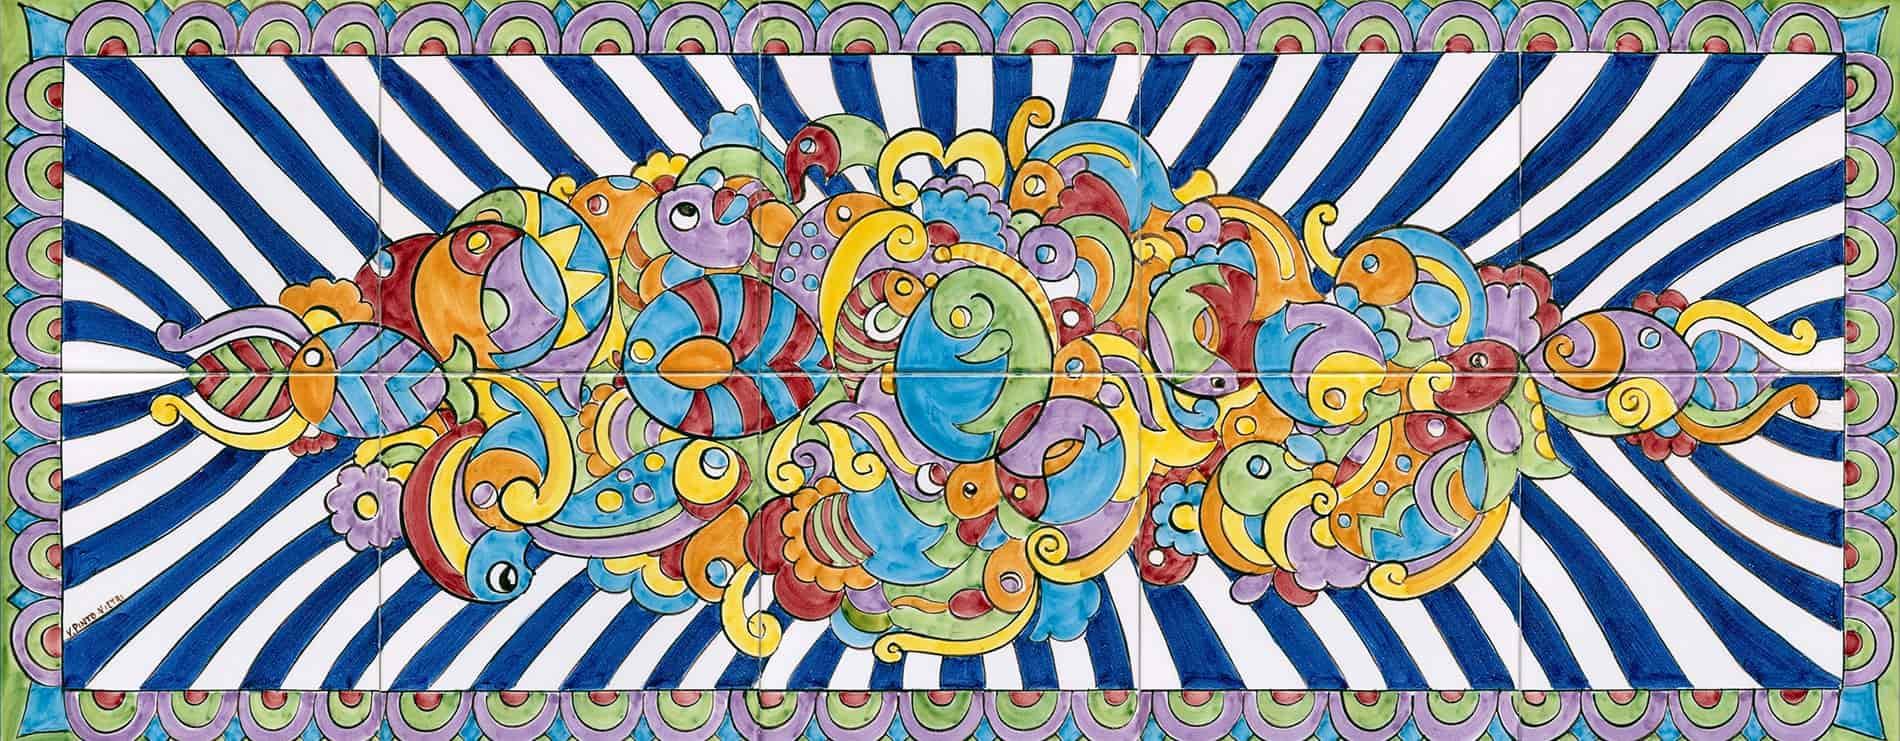 pannelli decorativi in ceramica